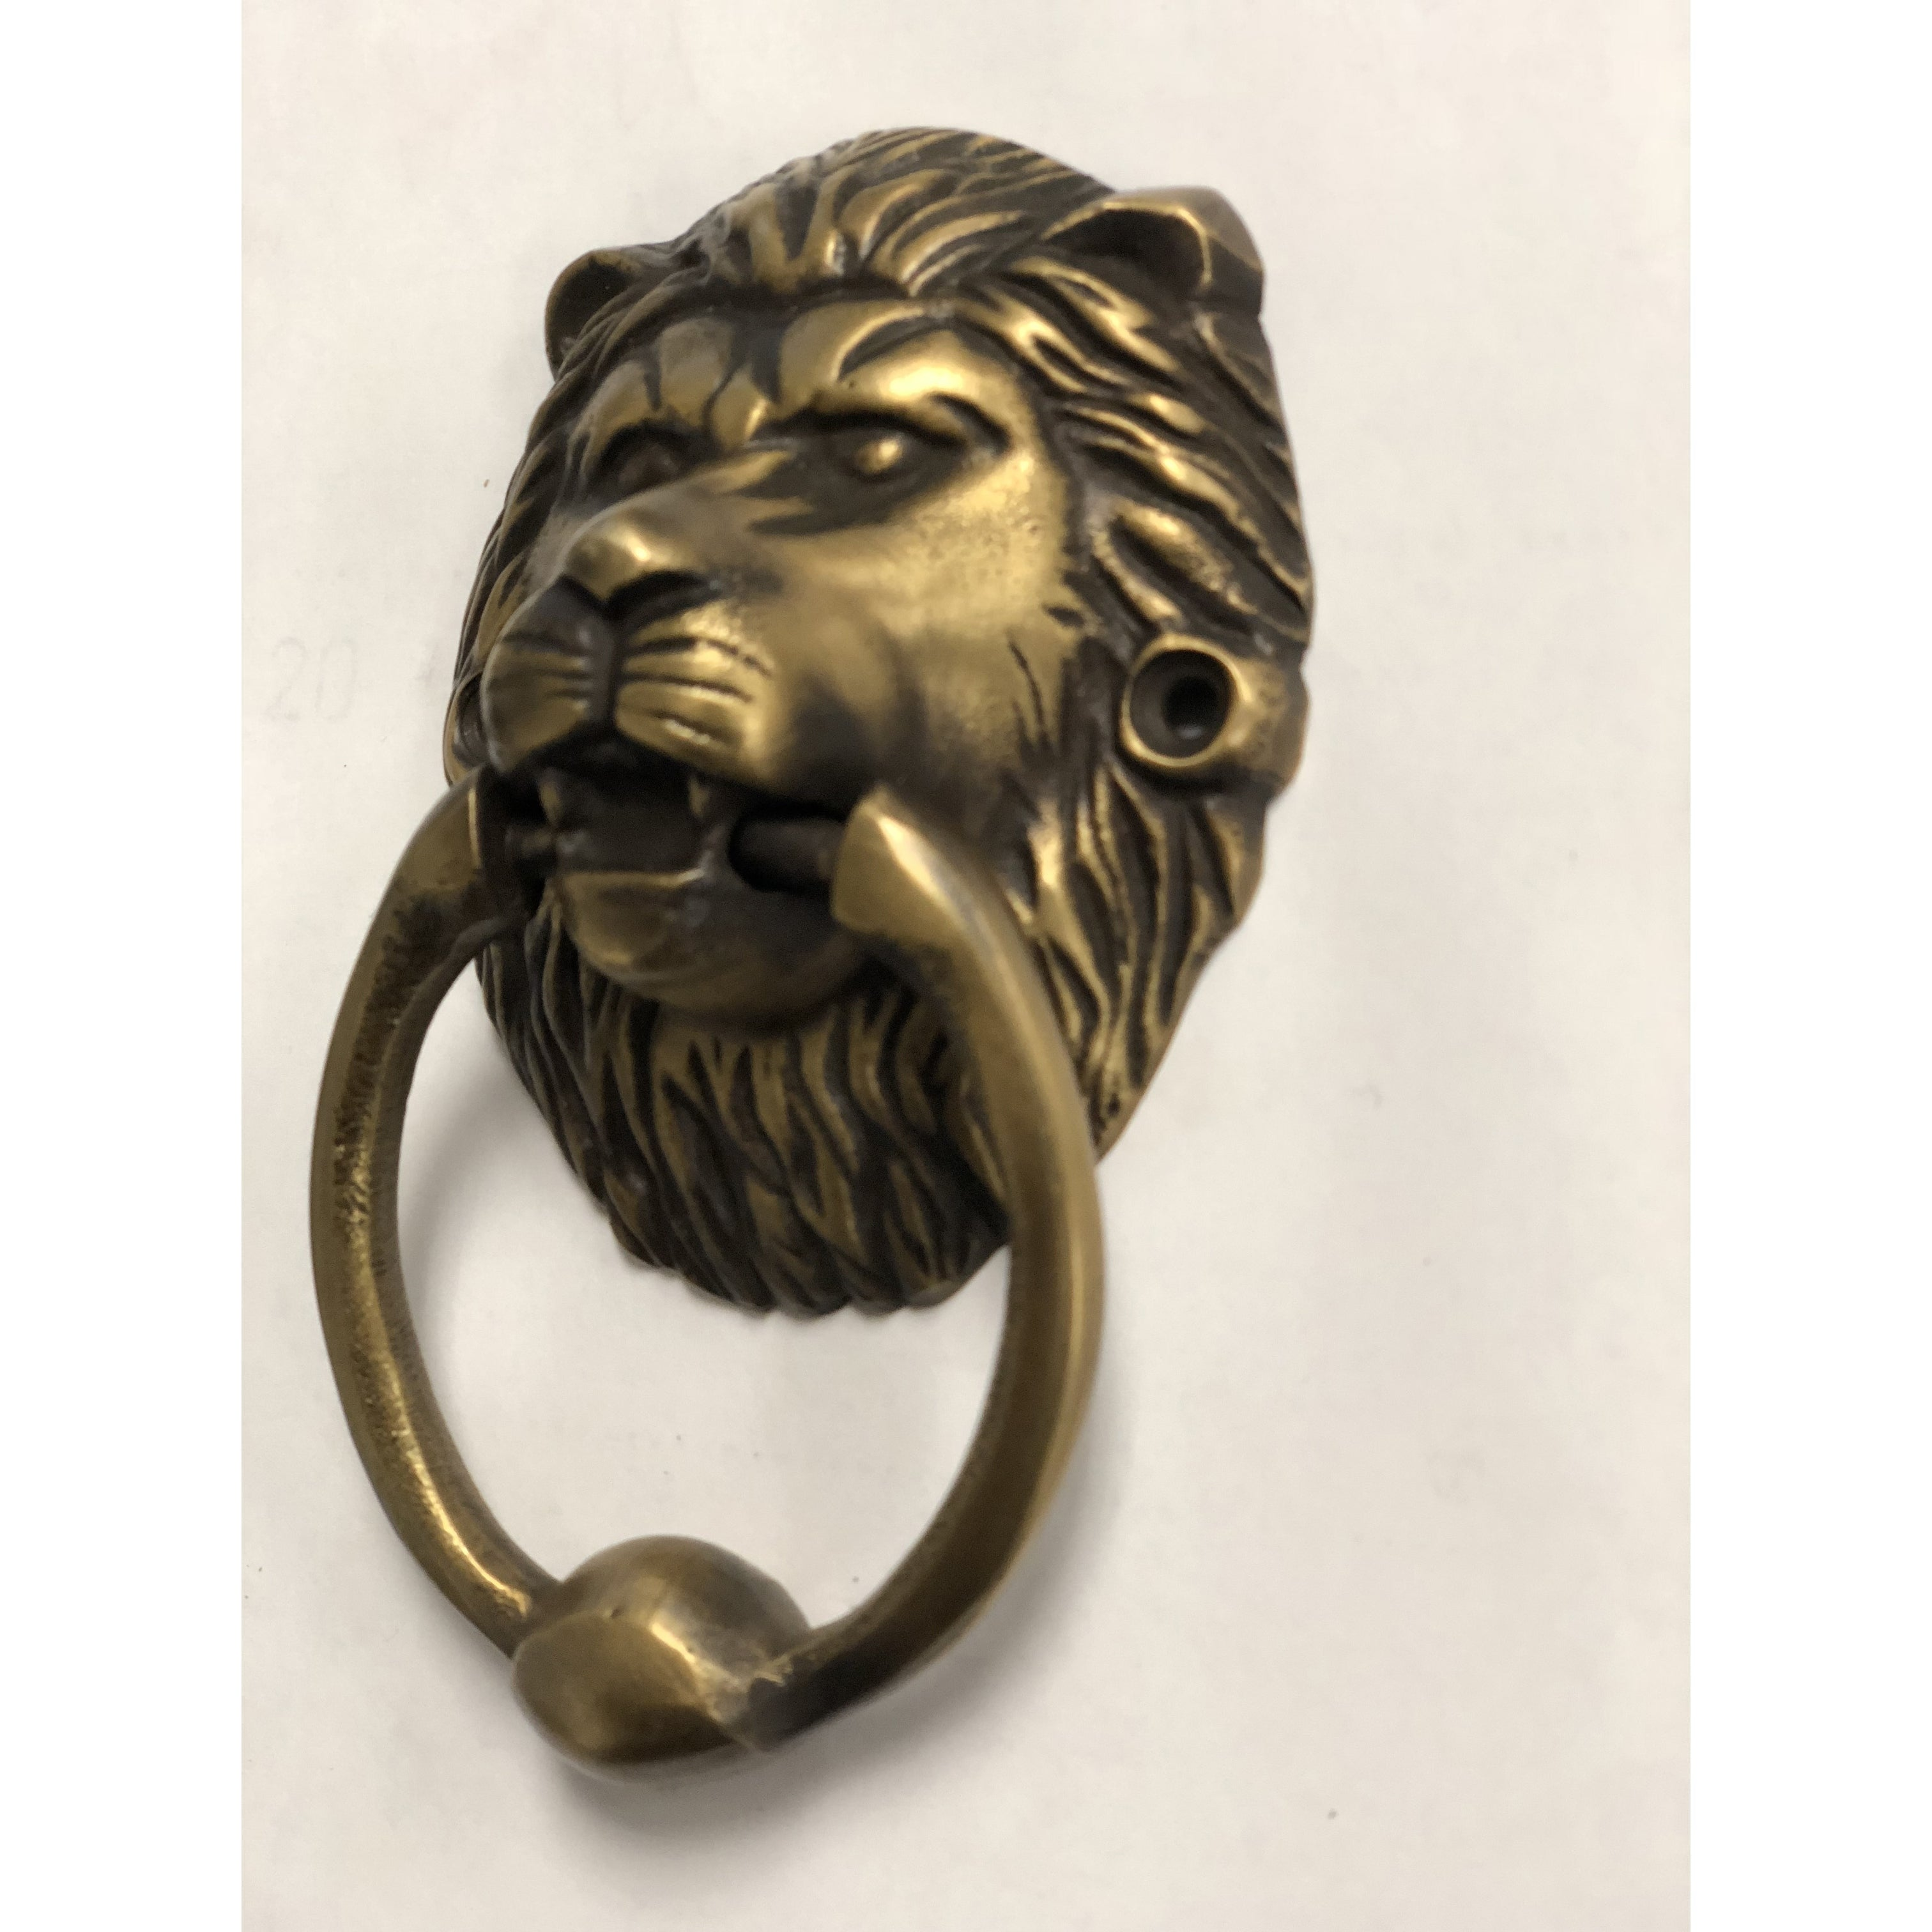 Brasso Lion Head Door Knocker Or Puller Sm